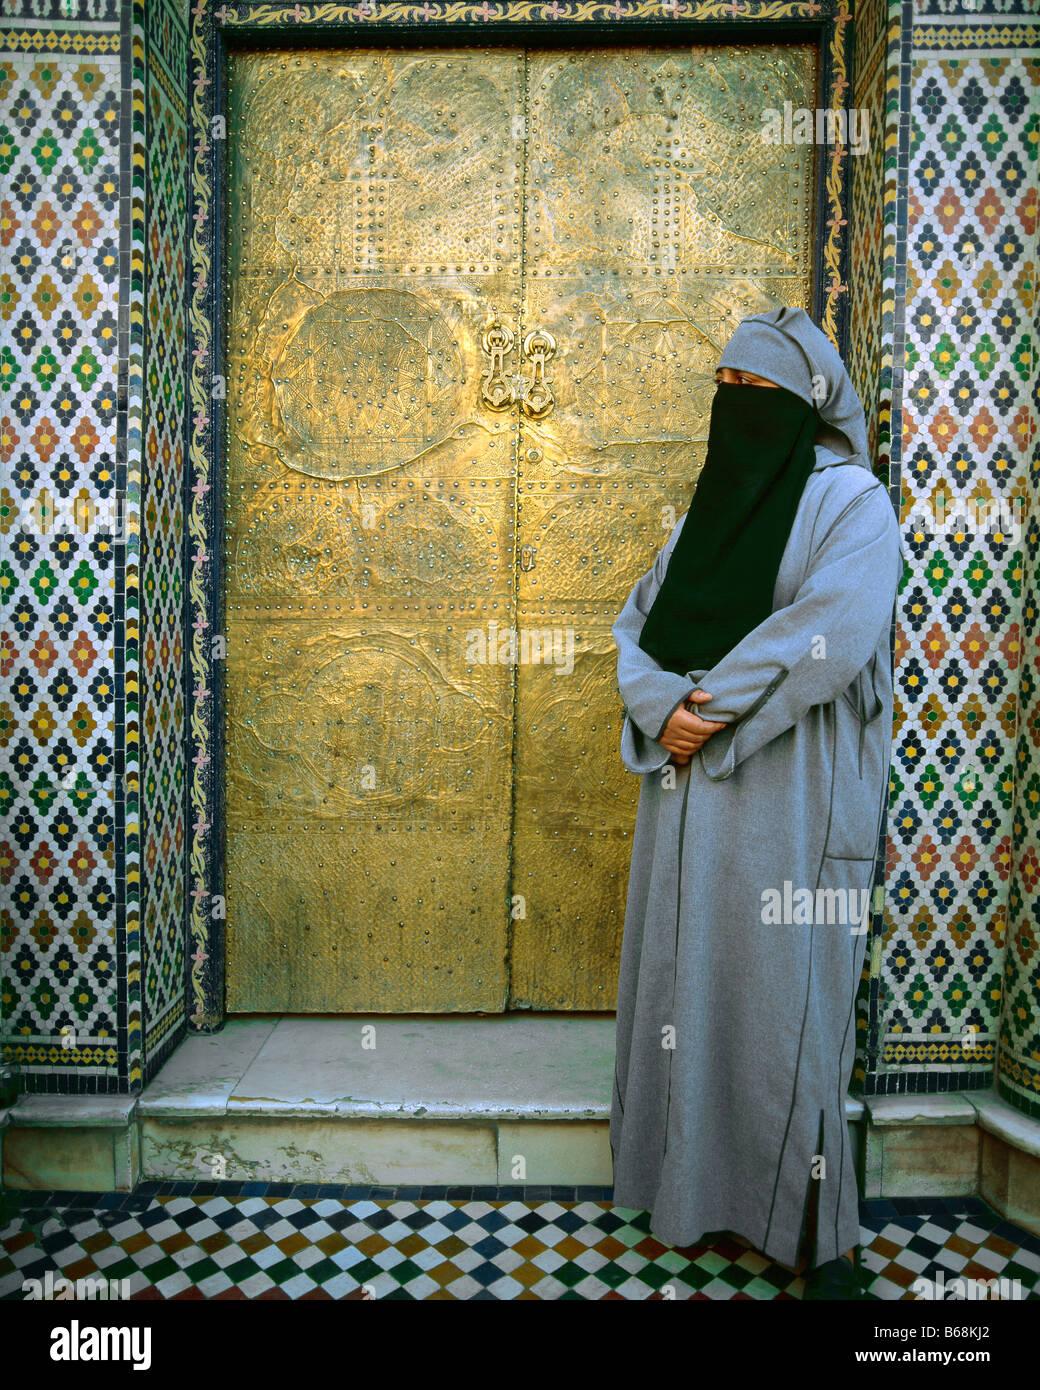 Femme voilée, Marrakech, Maroc Photo Stock